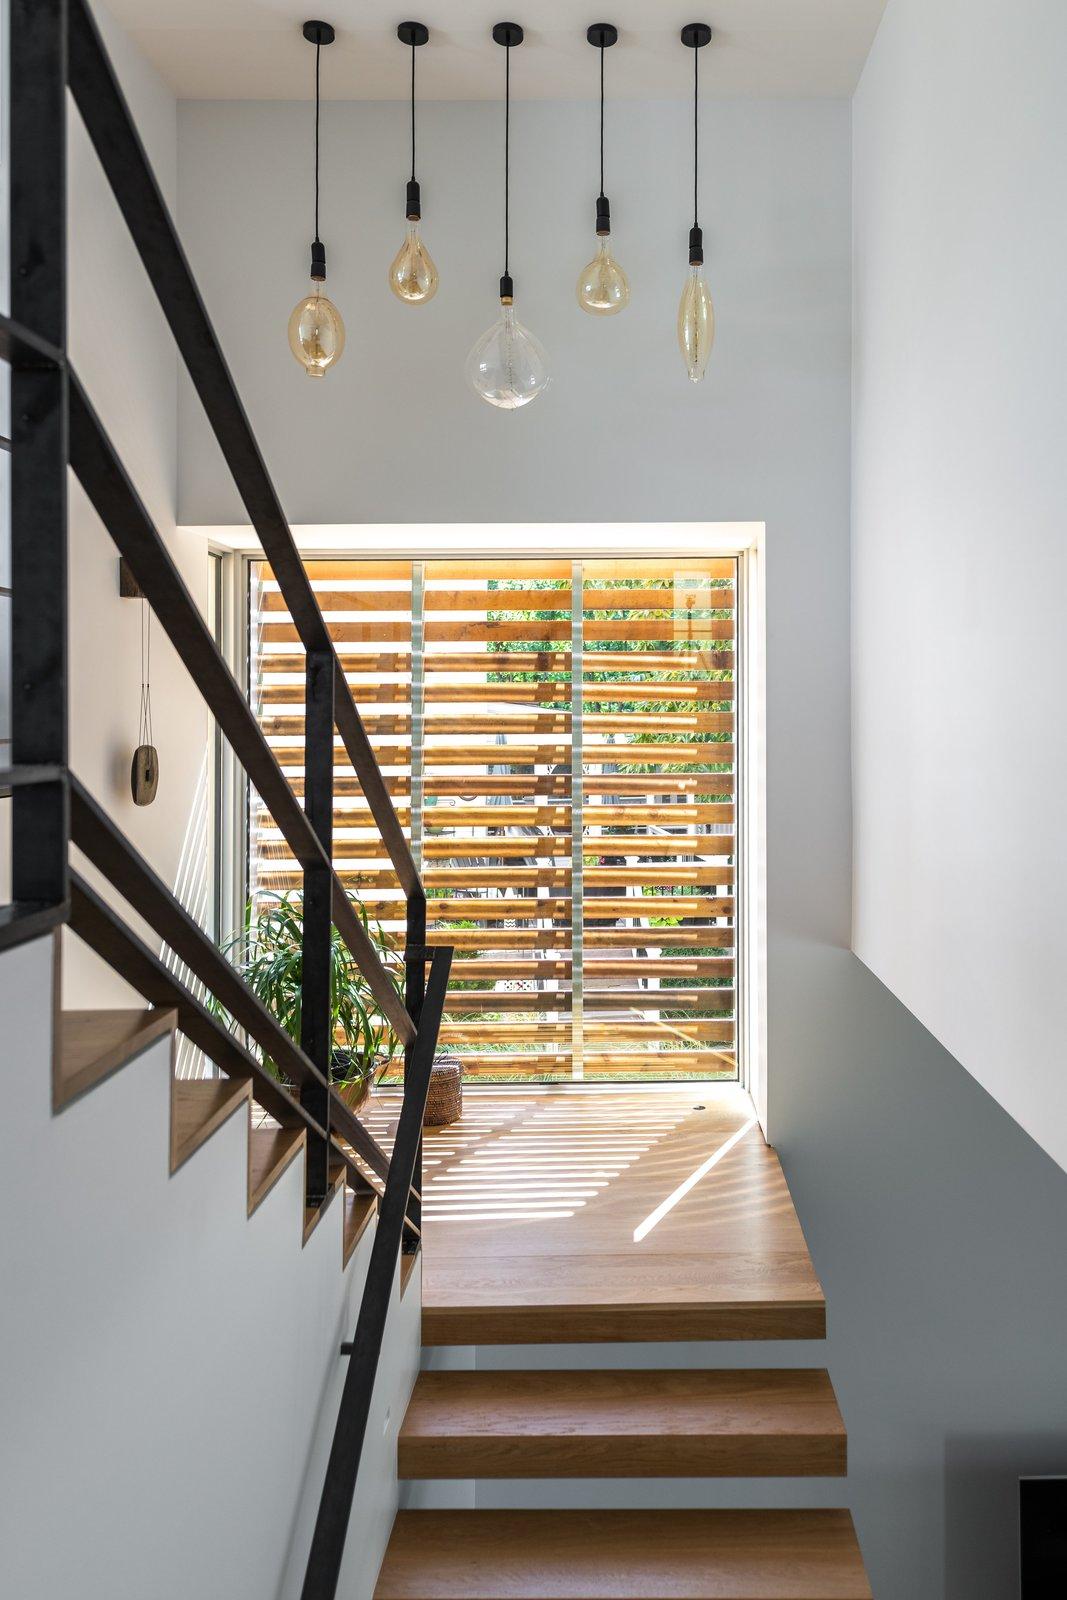 Staircase, Wood Tread, Metal Tread, and Metal Railing Stair  Spa Creek House by GriD